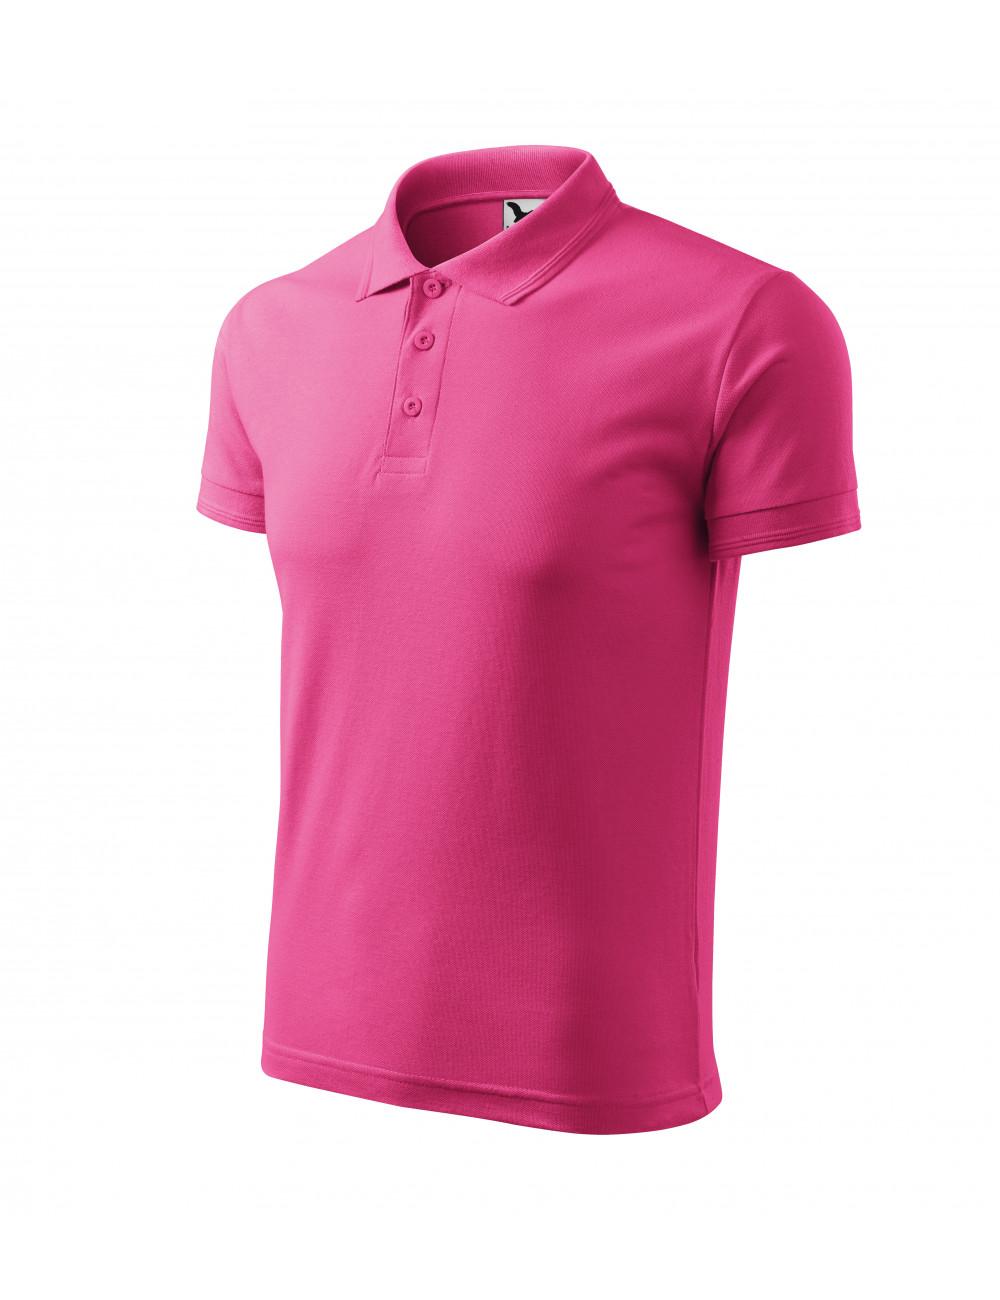 Adler MALFINI Koszulka polo męska Pique Polo 203 czerwień purpurowa